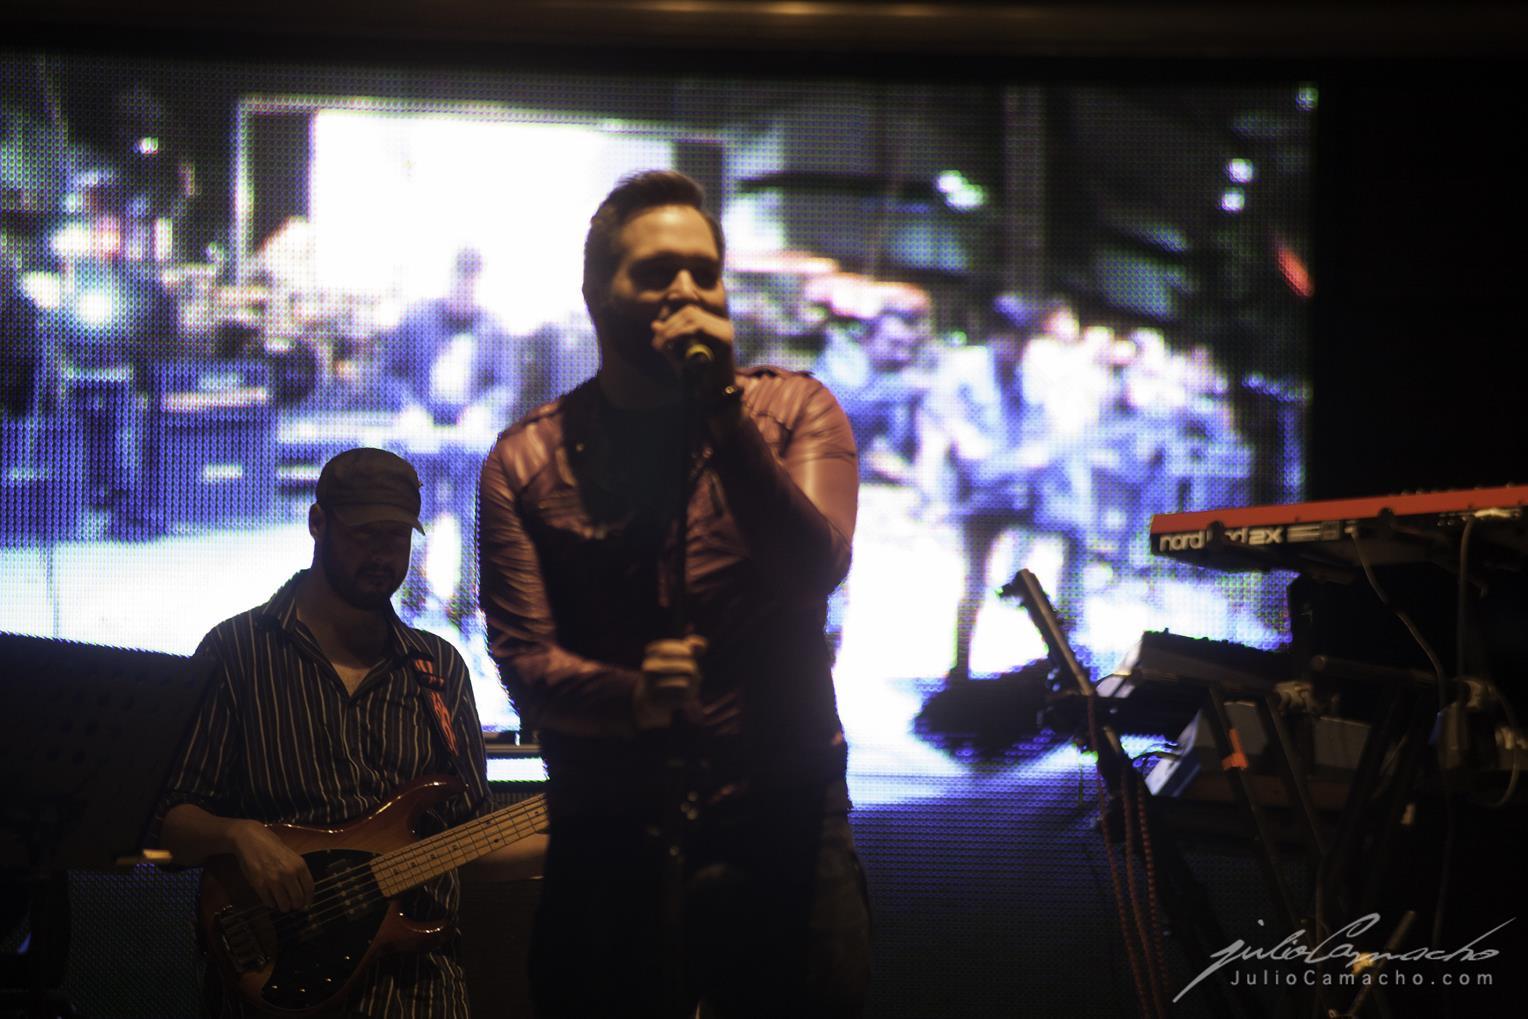 2014-10-30 31 CAST TOUR Ensenada y Tijuana - 1385 - www.Juli (Copy).jpg